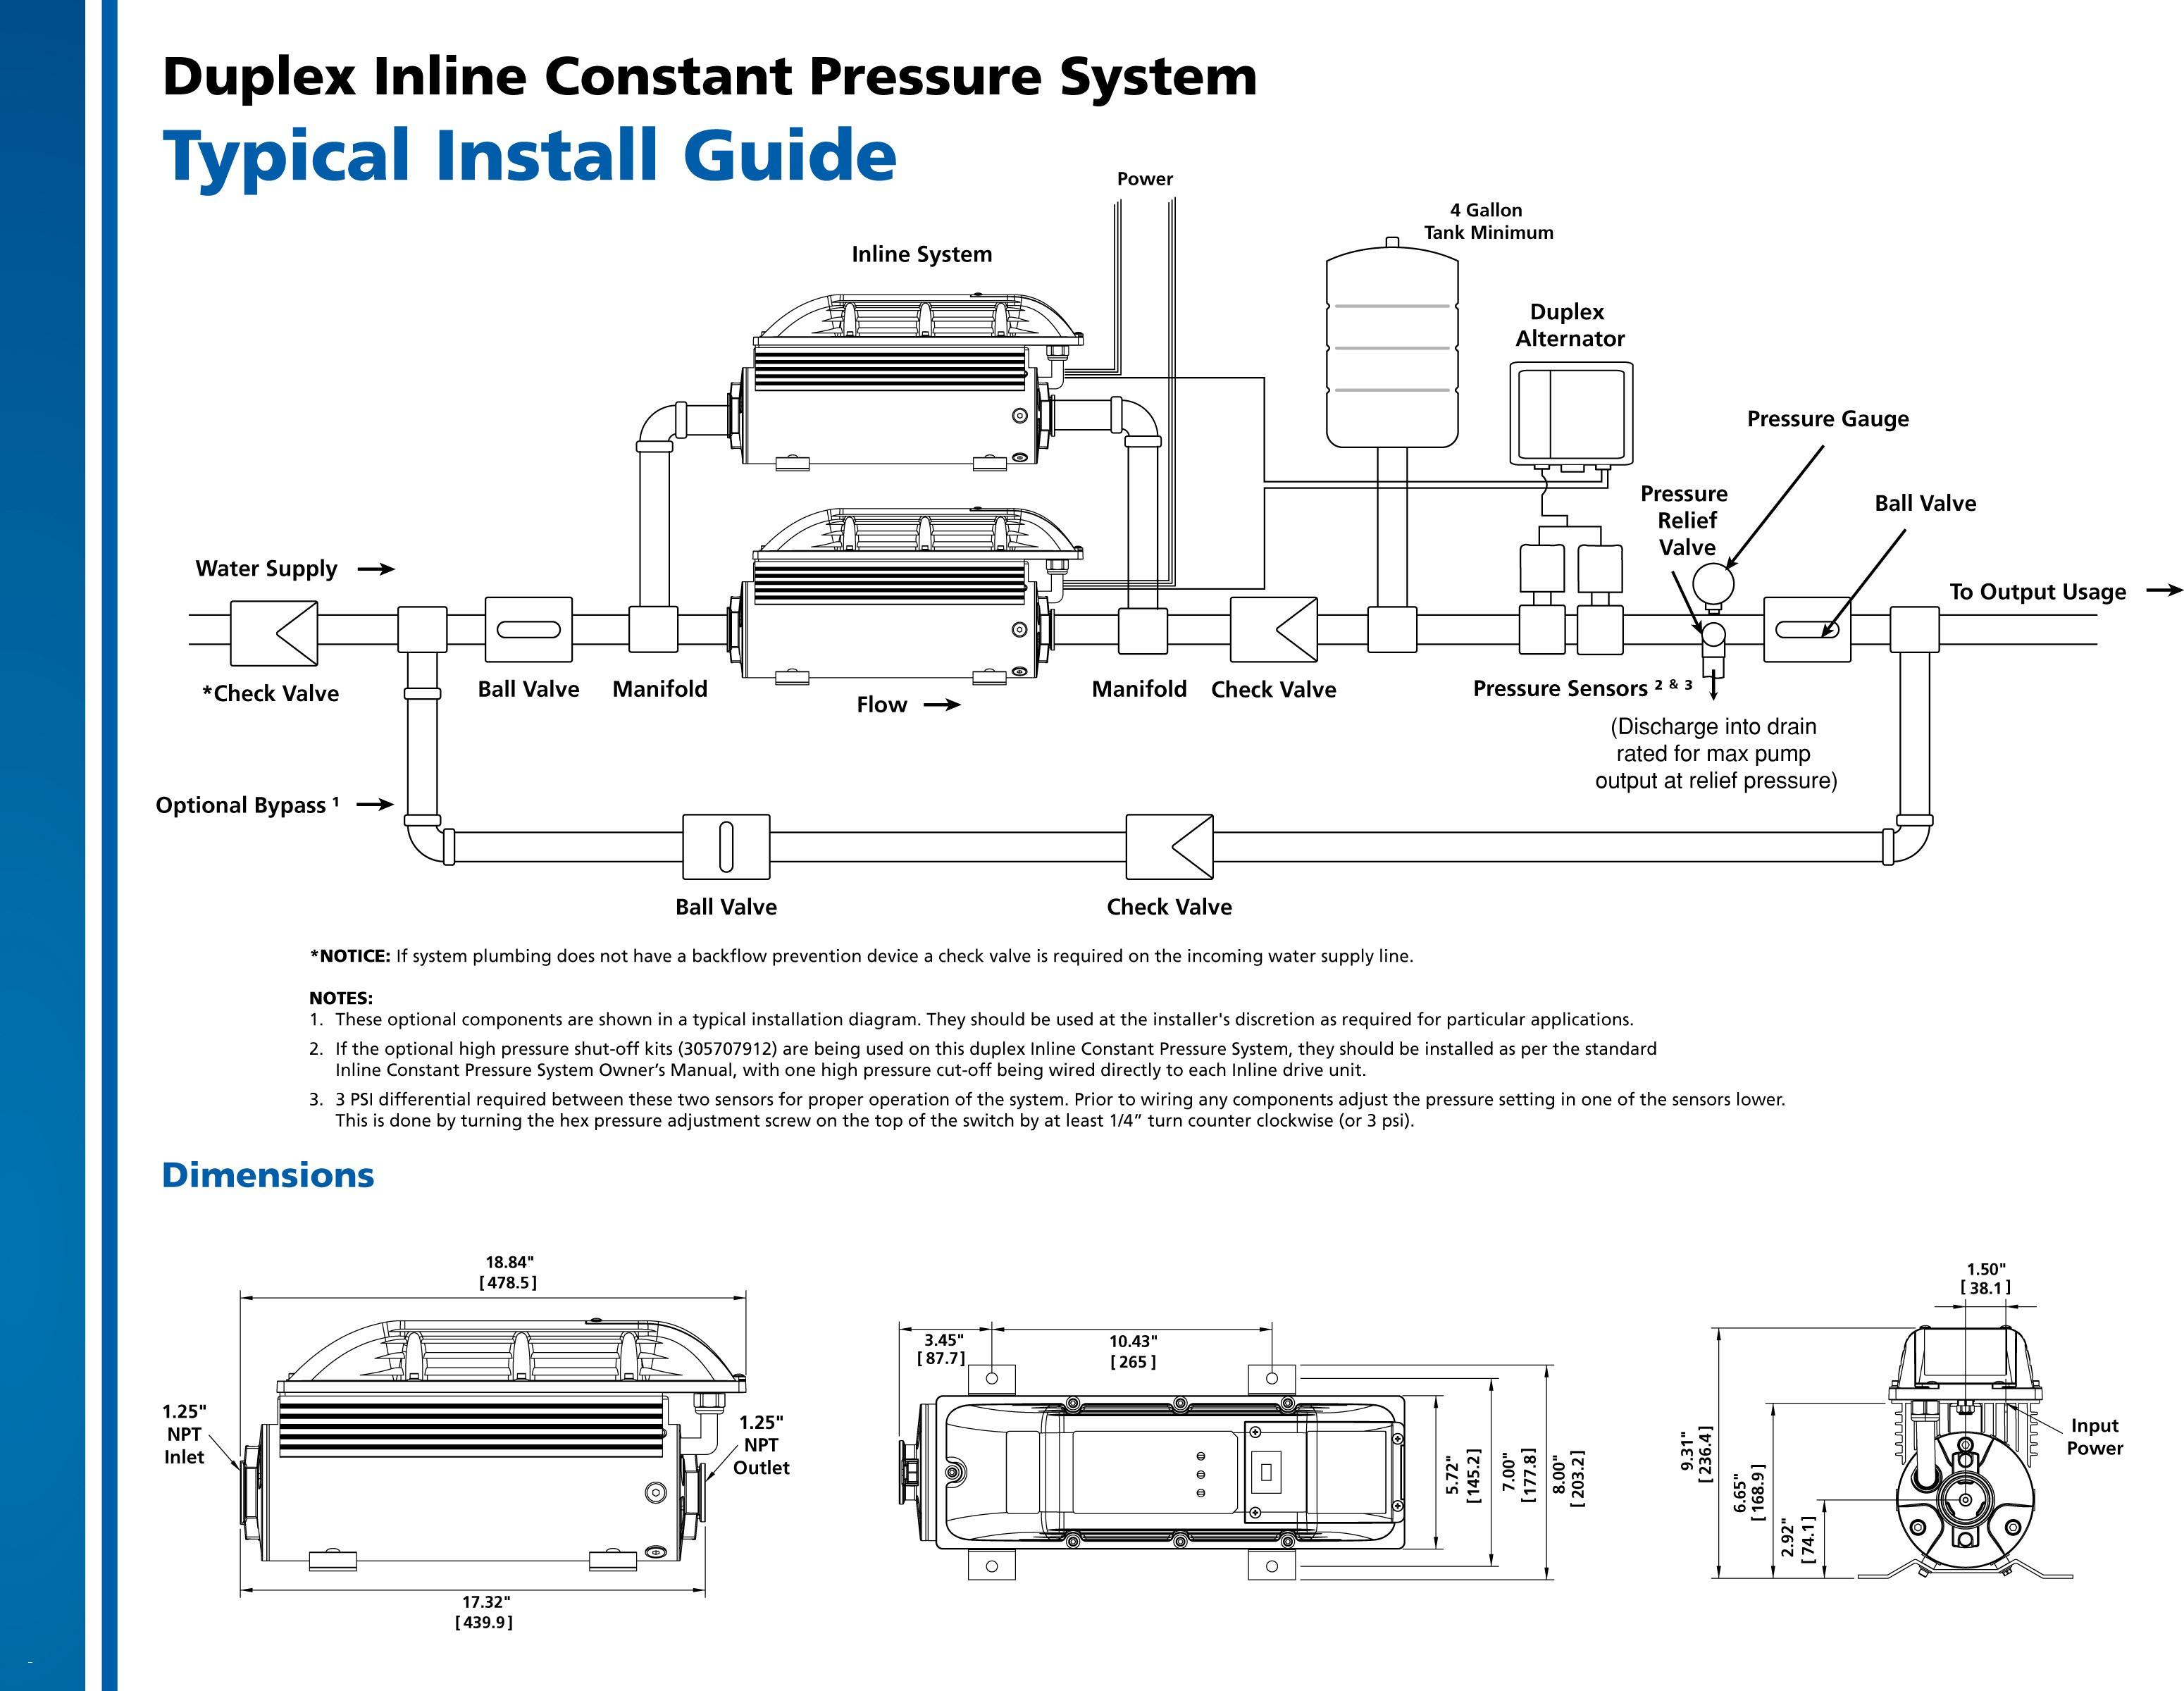 grundfos submersible pump wiring diagram animal small intestine control panel library